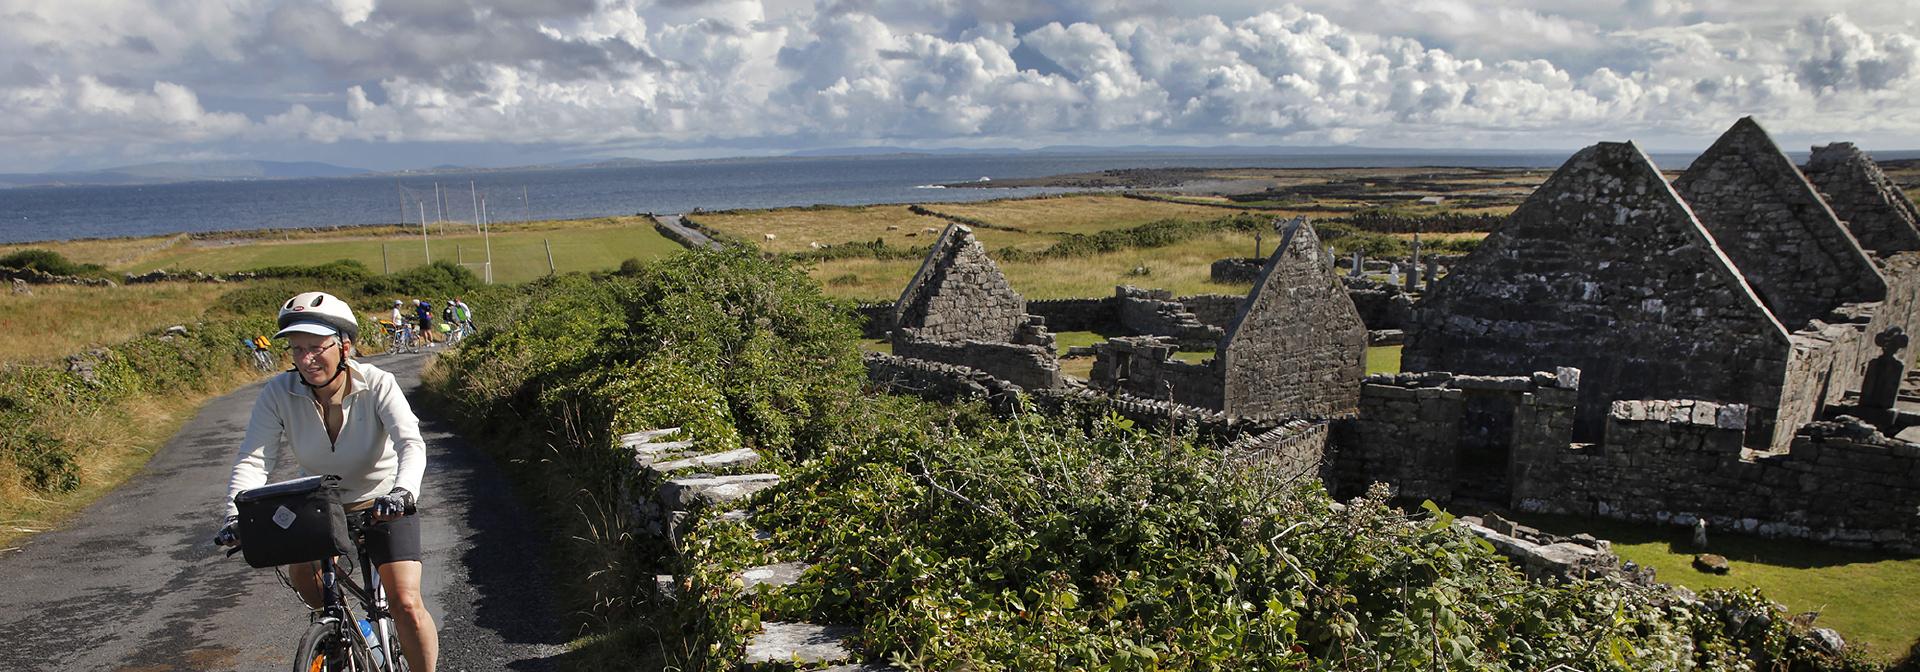 Ireland: Connemara